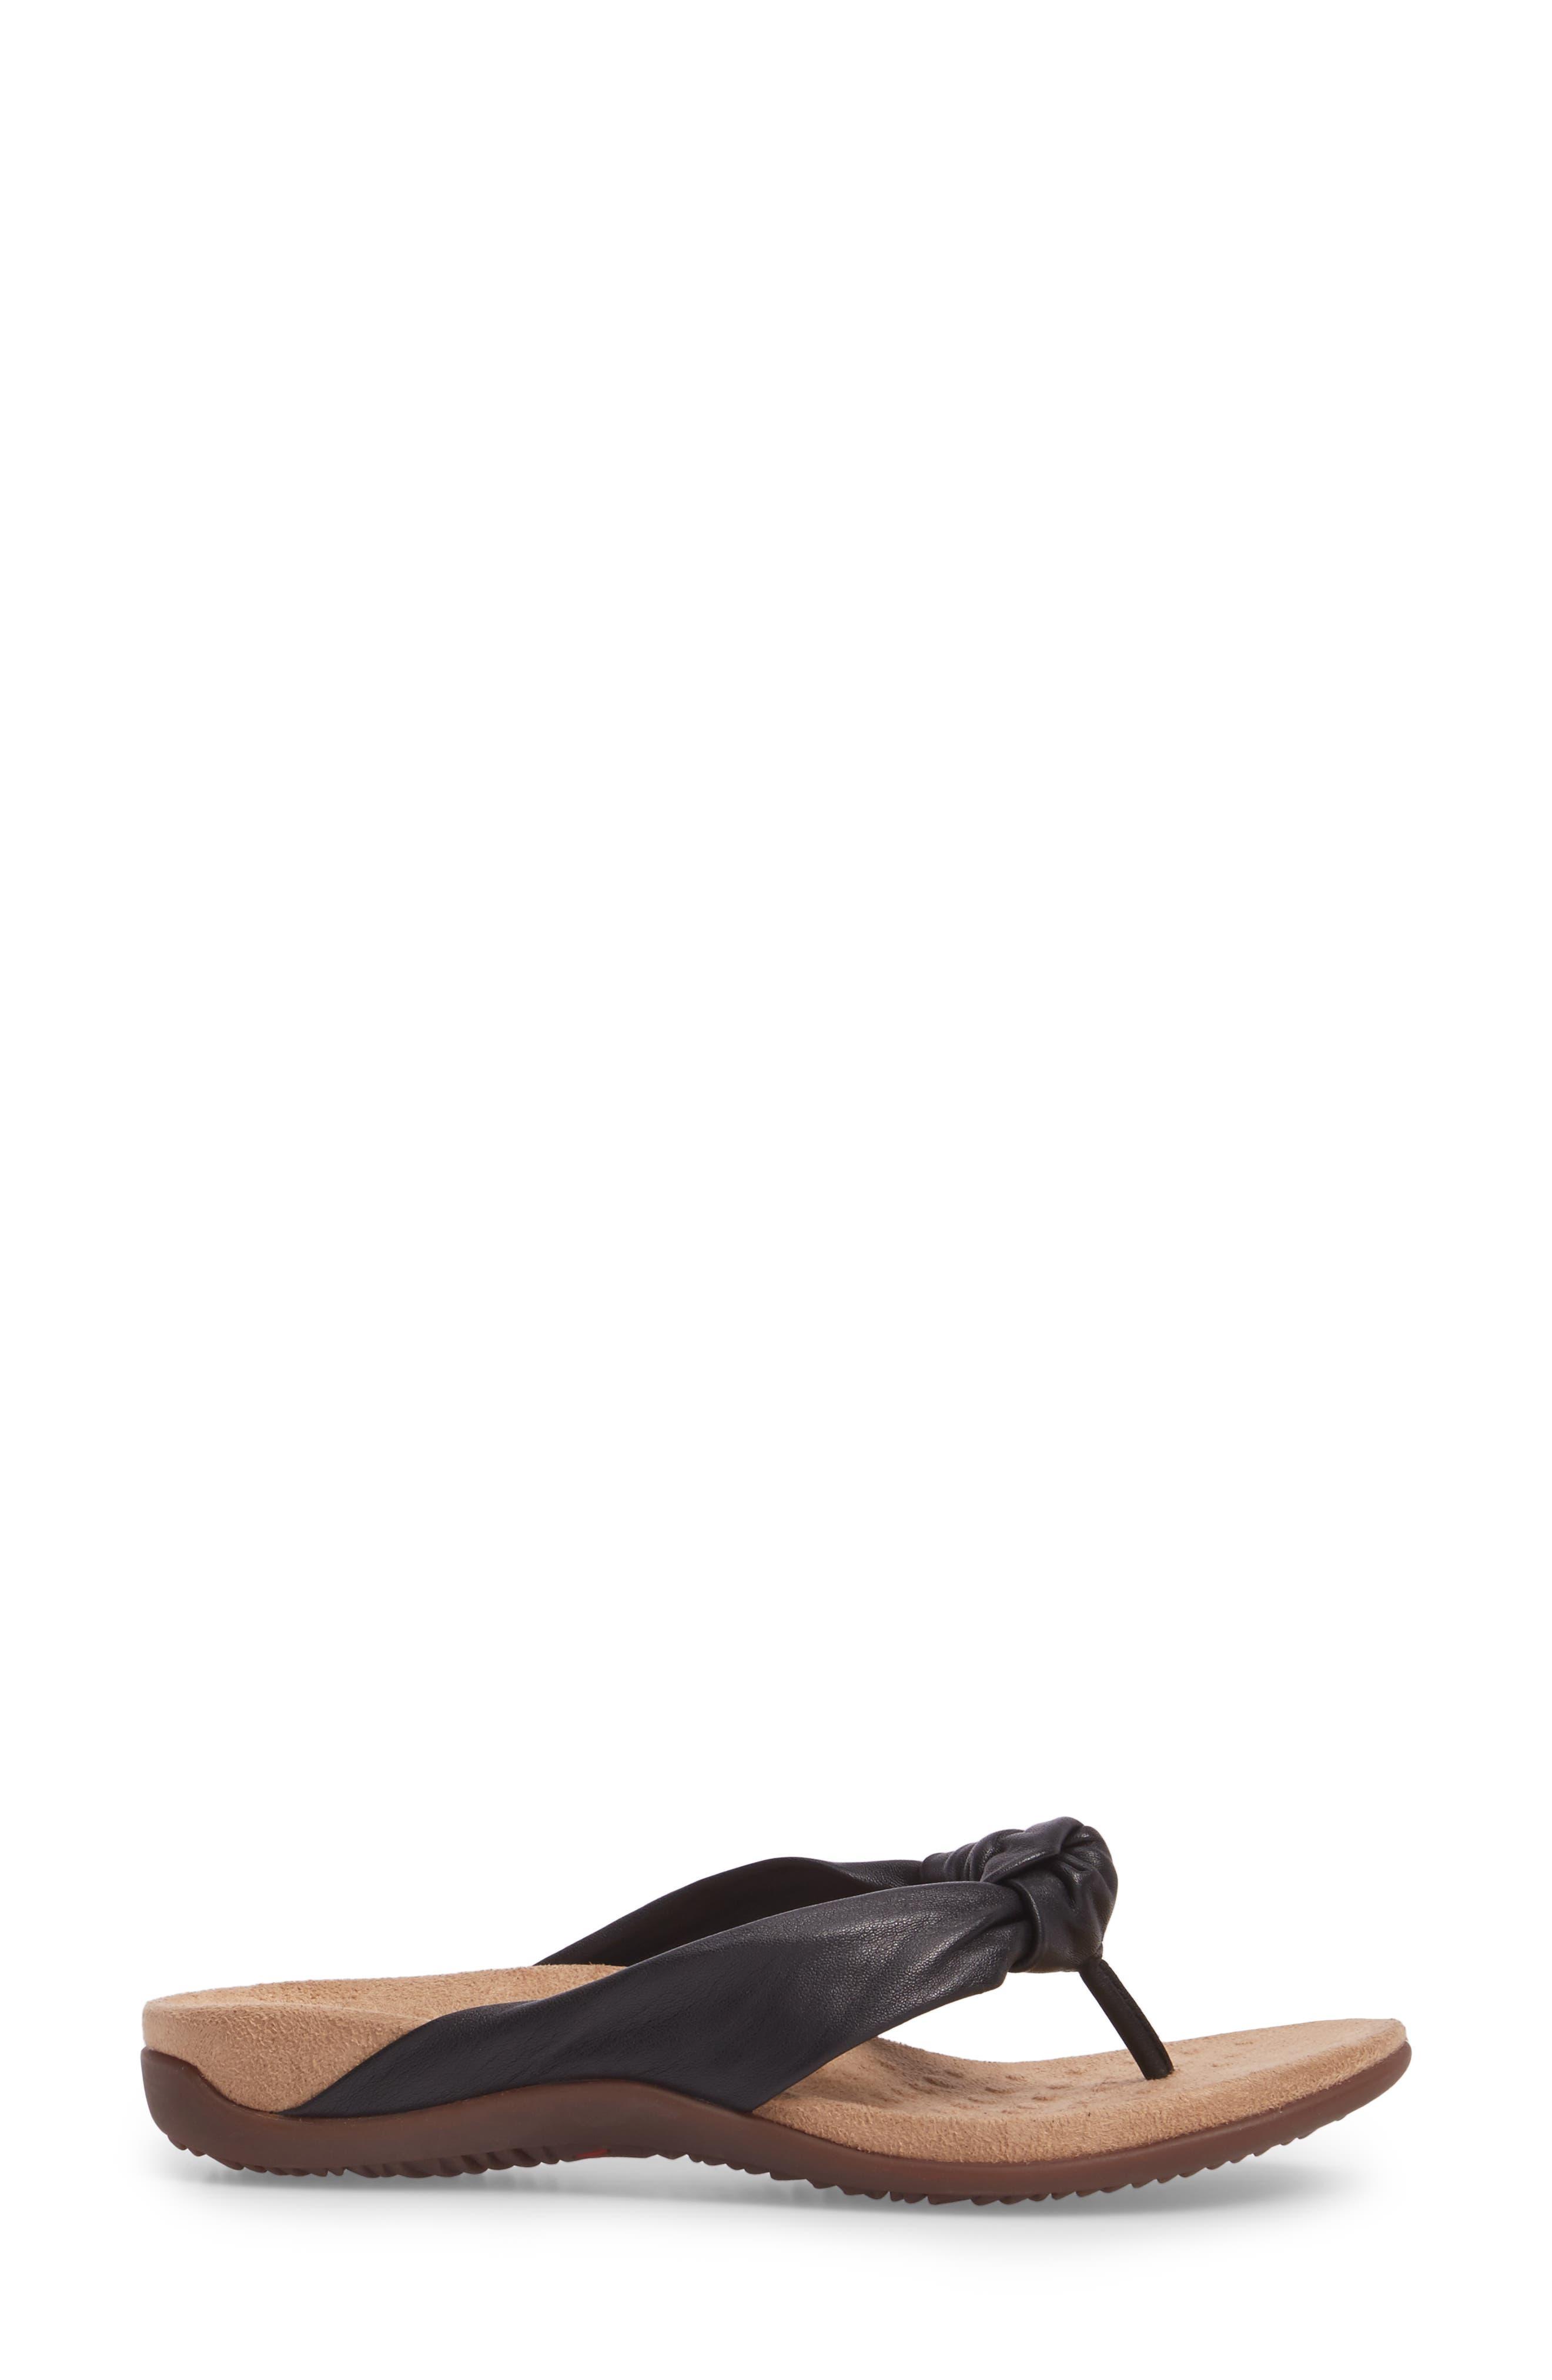 Pippa Flip Flop,                             Alternate thumbnail 3, color,                             Black Leather